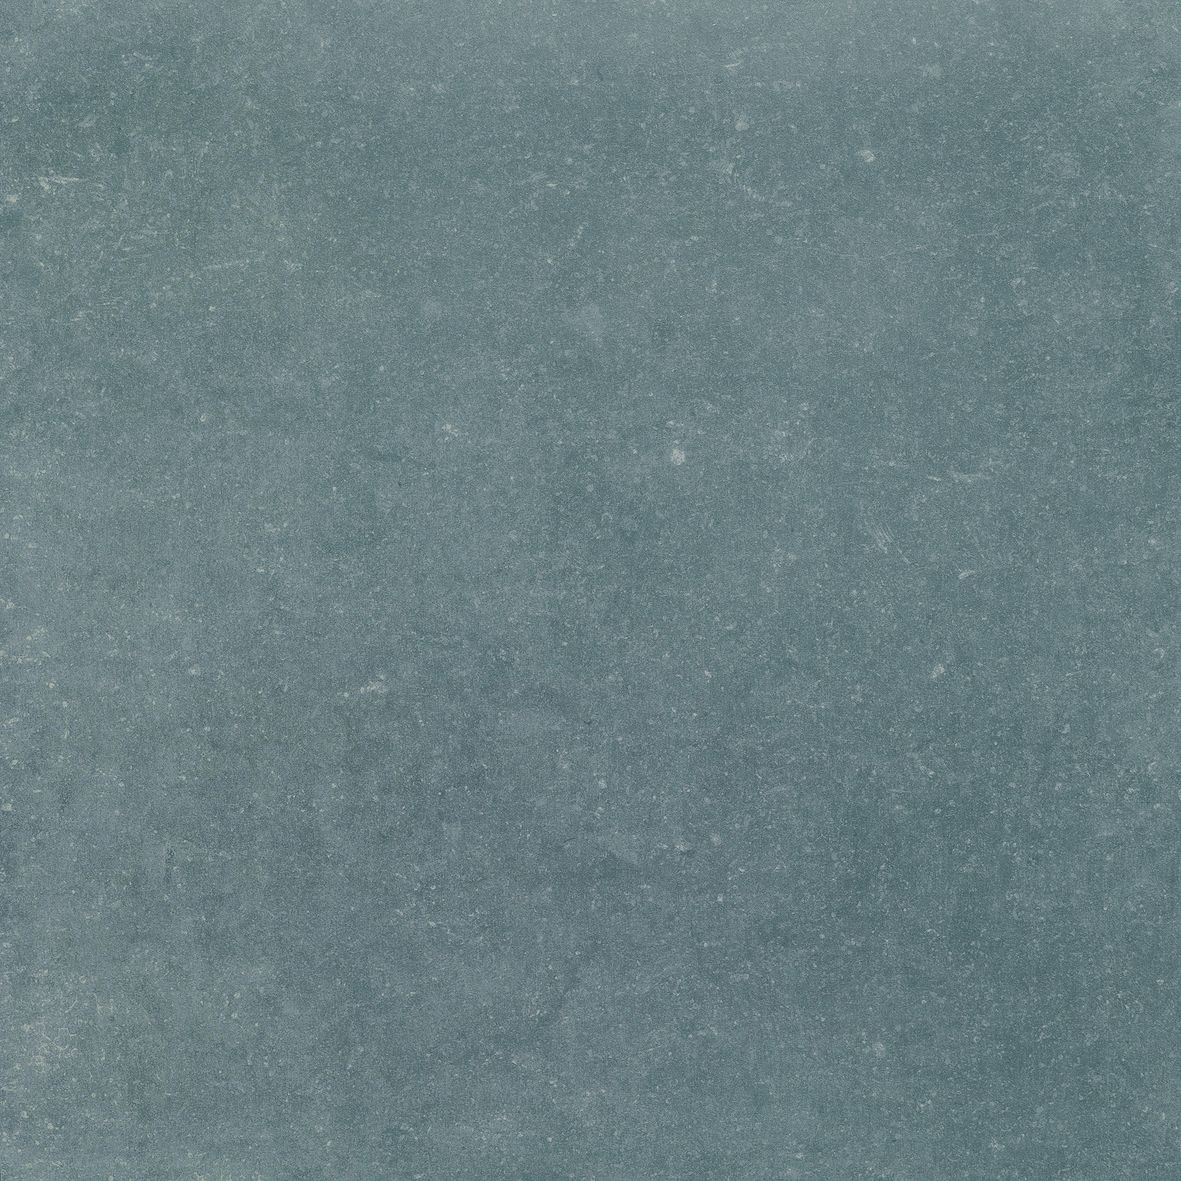 B&B Bluestone tegel 60 x 60 cm gris gerectificeerd (3 stuks)